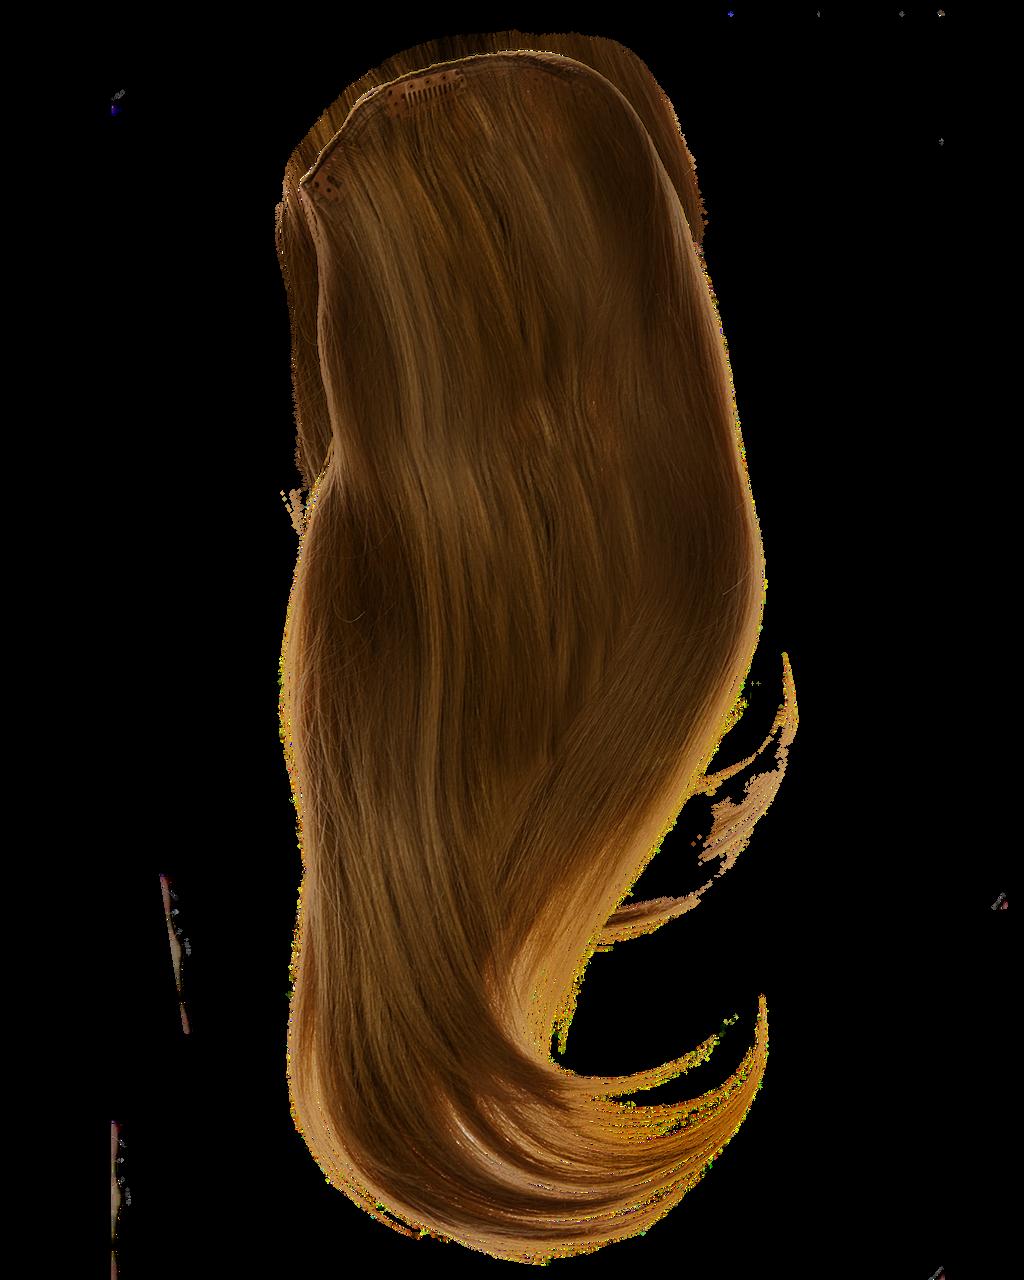 hair png - photo #12